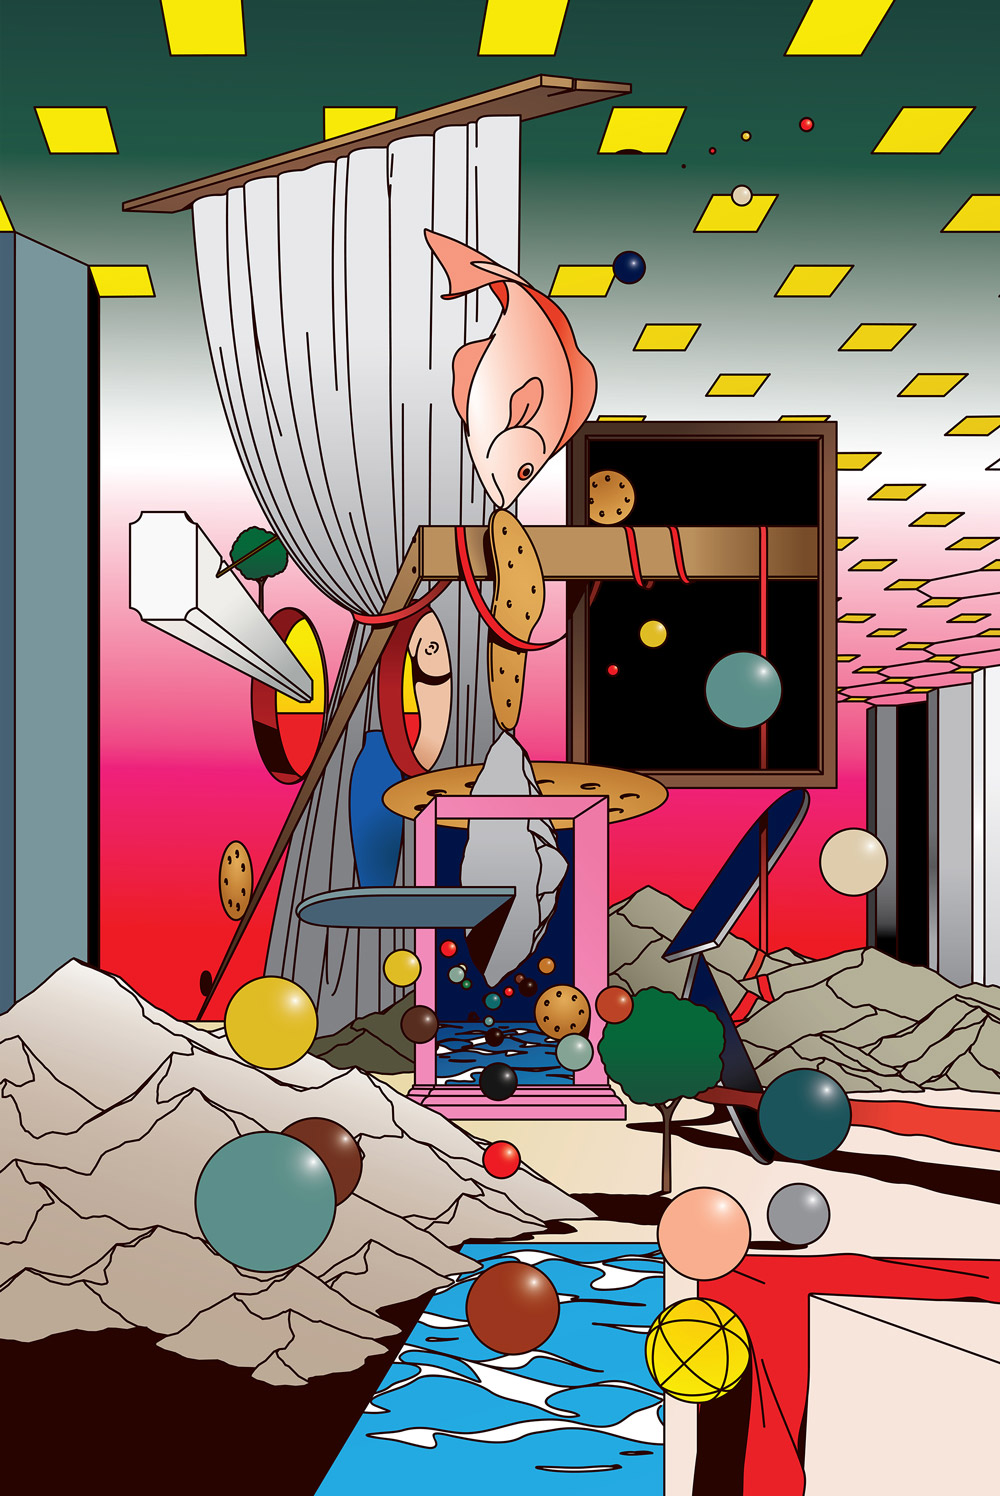 Edward Carvalho-Monaghan | Personal Work